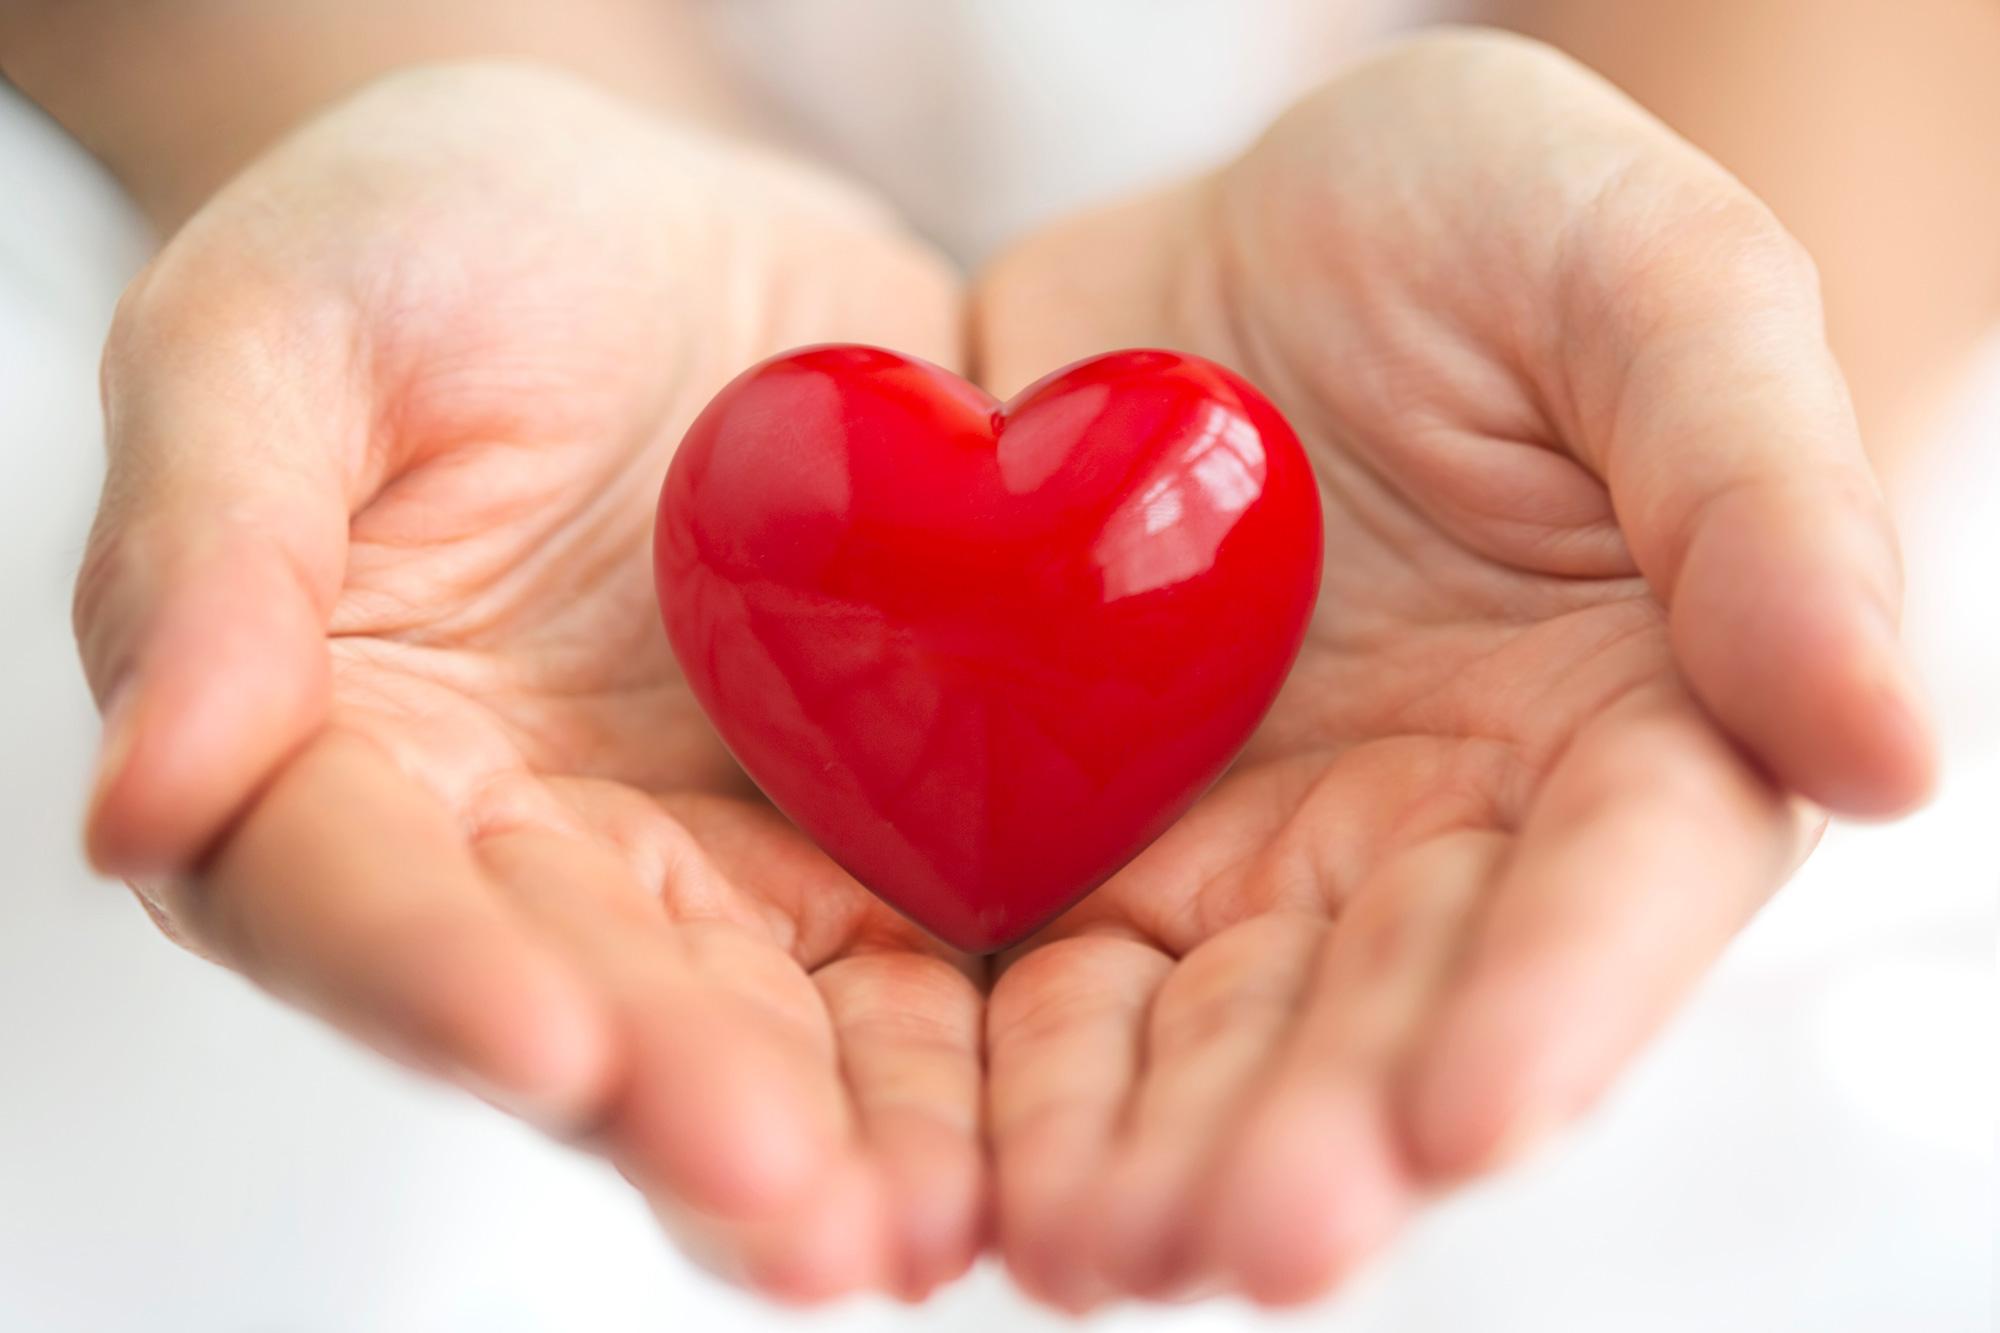 Картинки сердце не ладони